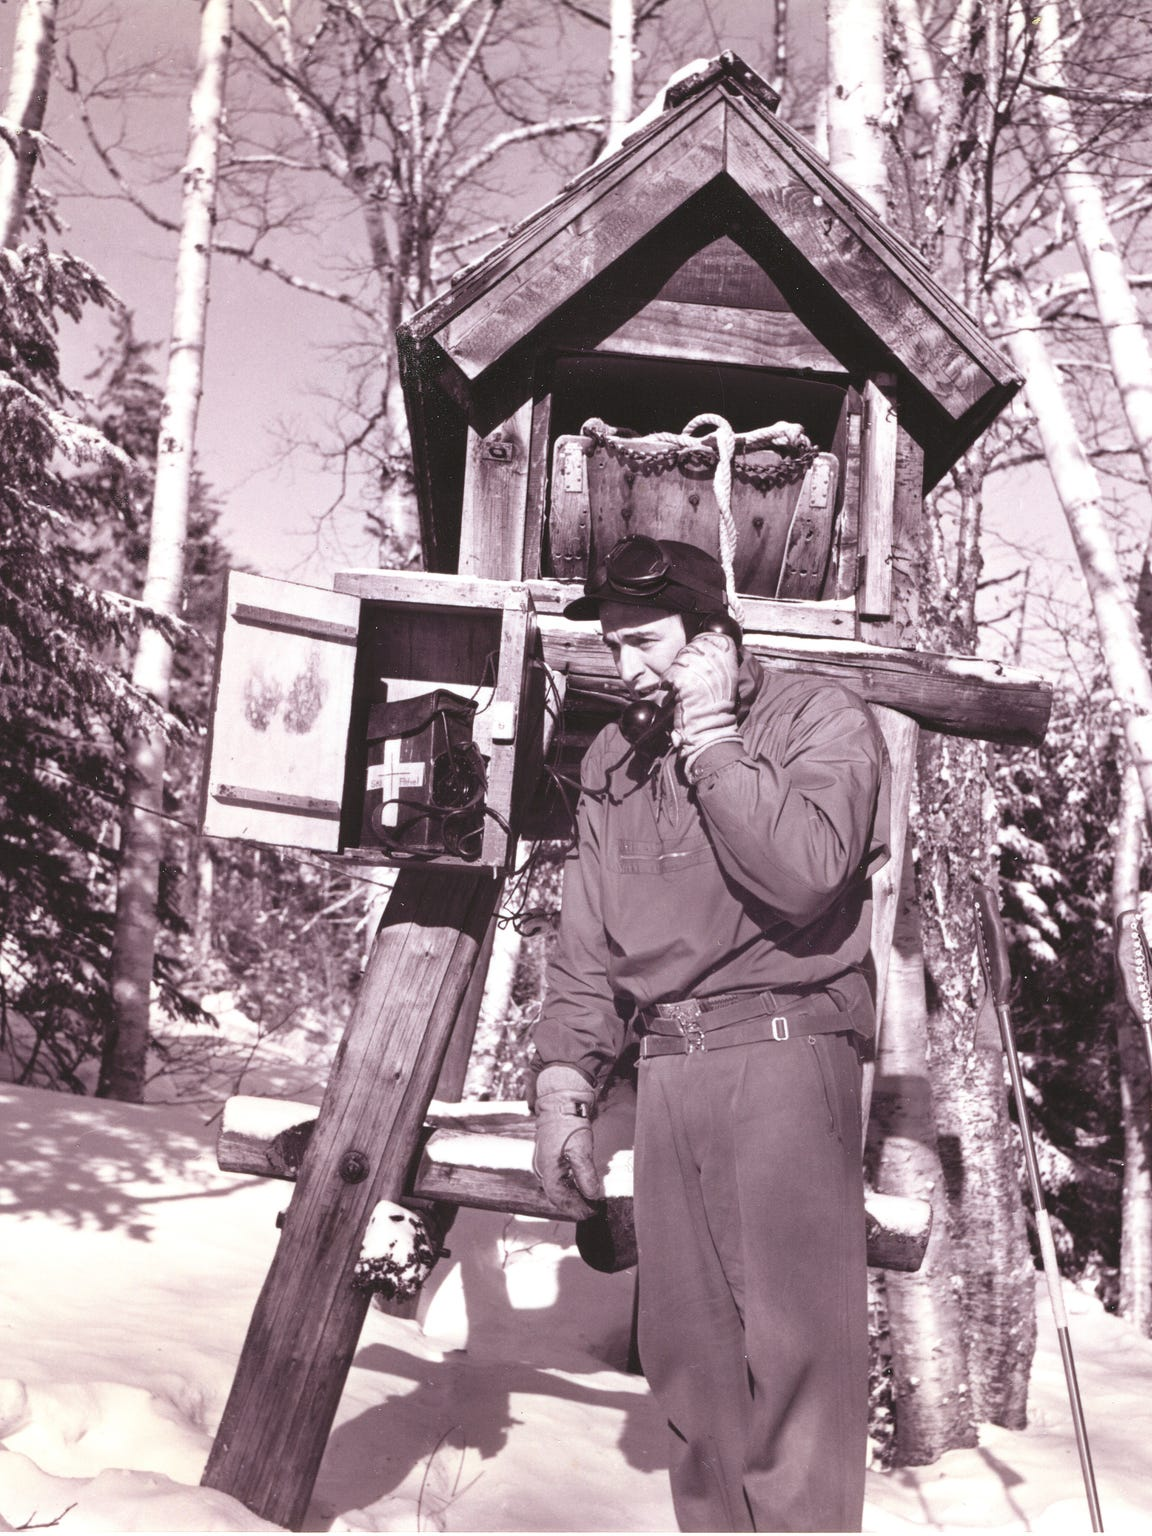 In this 1952 photo, Mount Mansfield Ski Patroller Willis